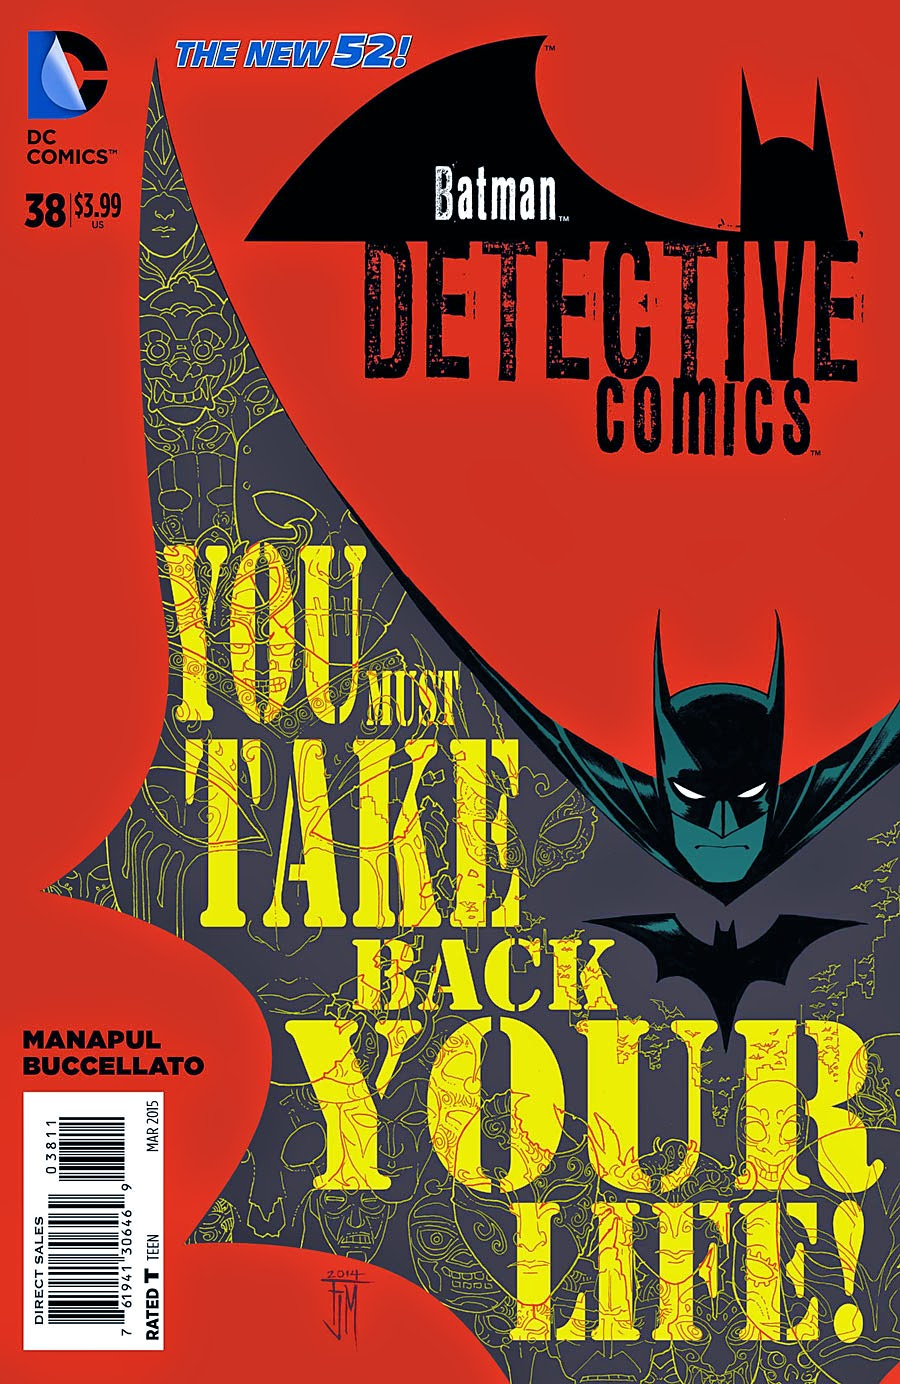 MAN OF BRONZE: PREVIEW DETECTIVE COMICS # 38